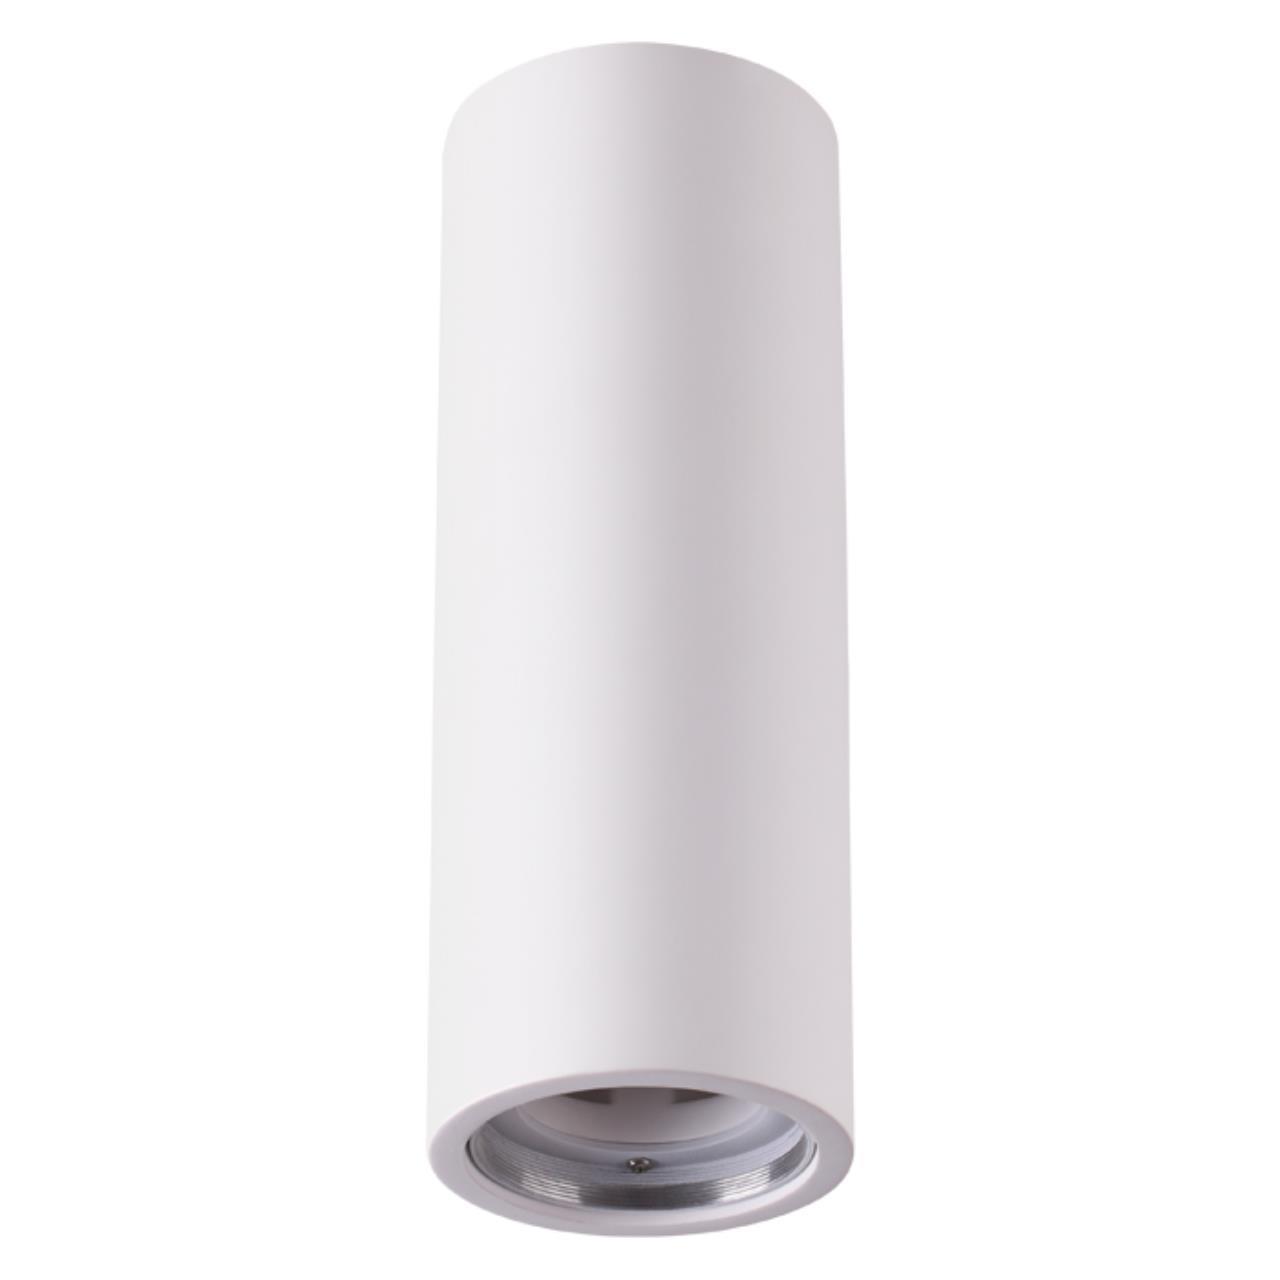 370509 KONST NT19 034 белый Накладной светильник IP20 GU10 50W 220-240V LEGIO